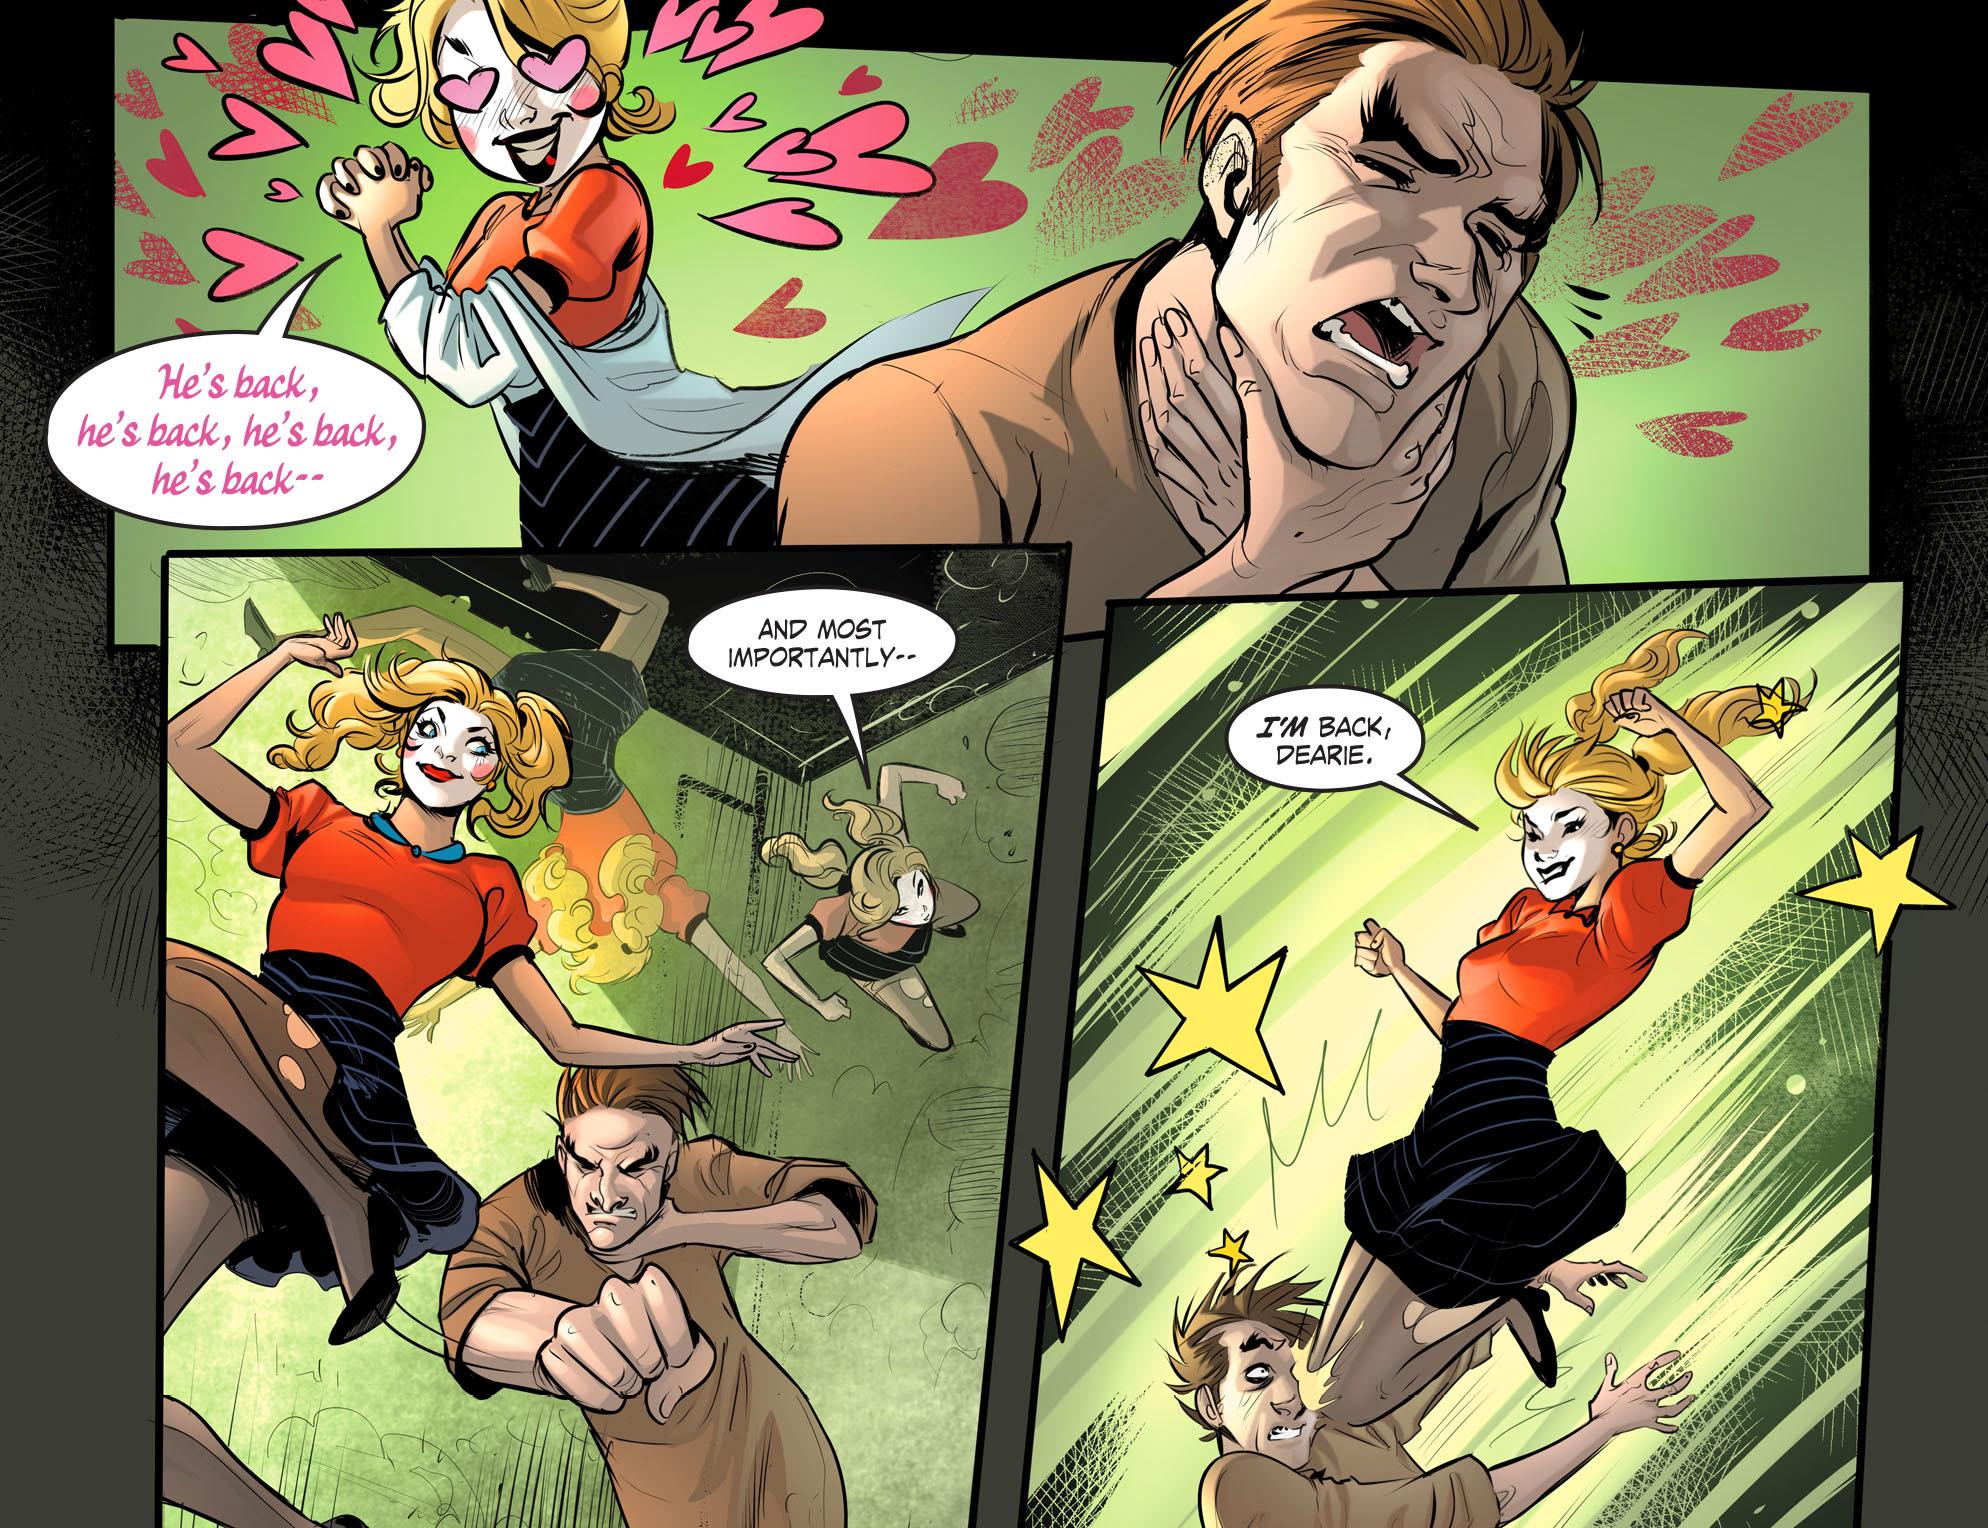 DC COMICS BOMBSHELLS #11 page 12